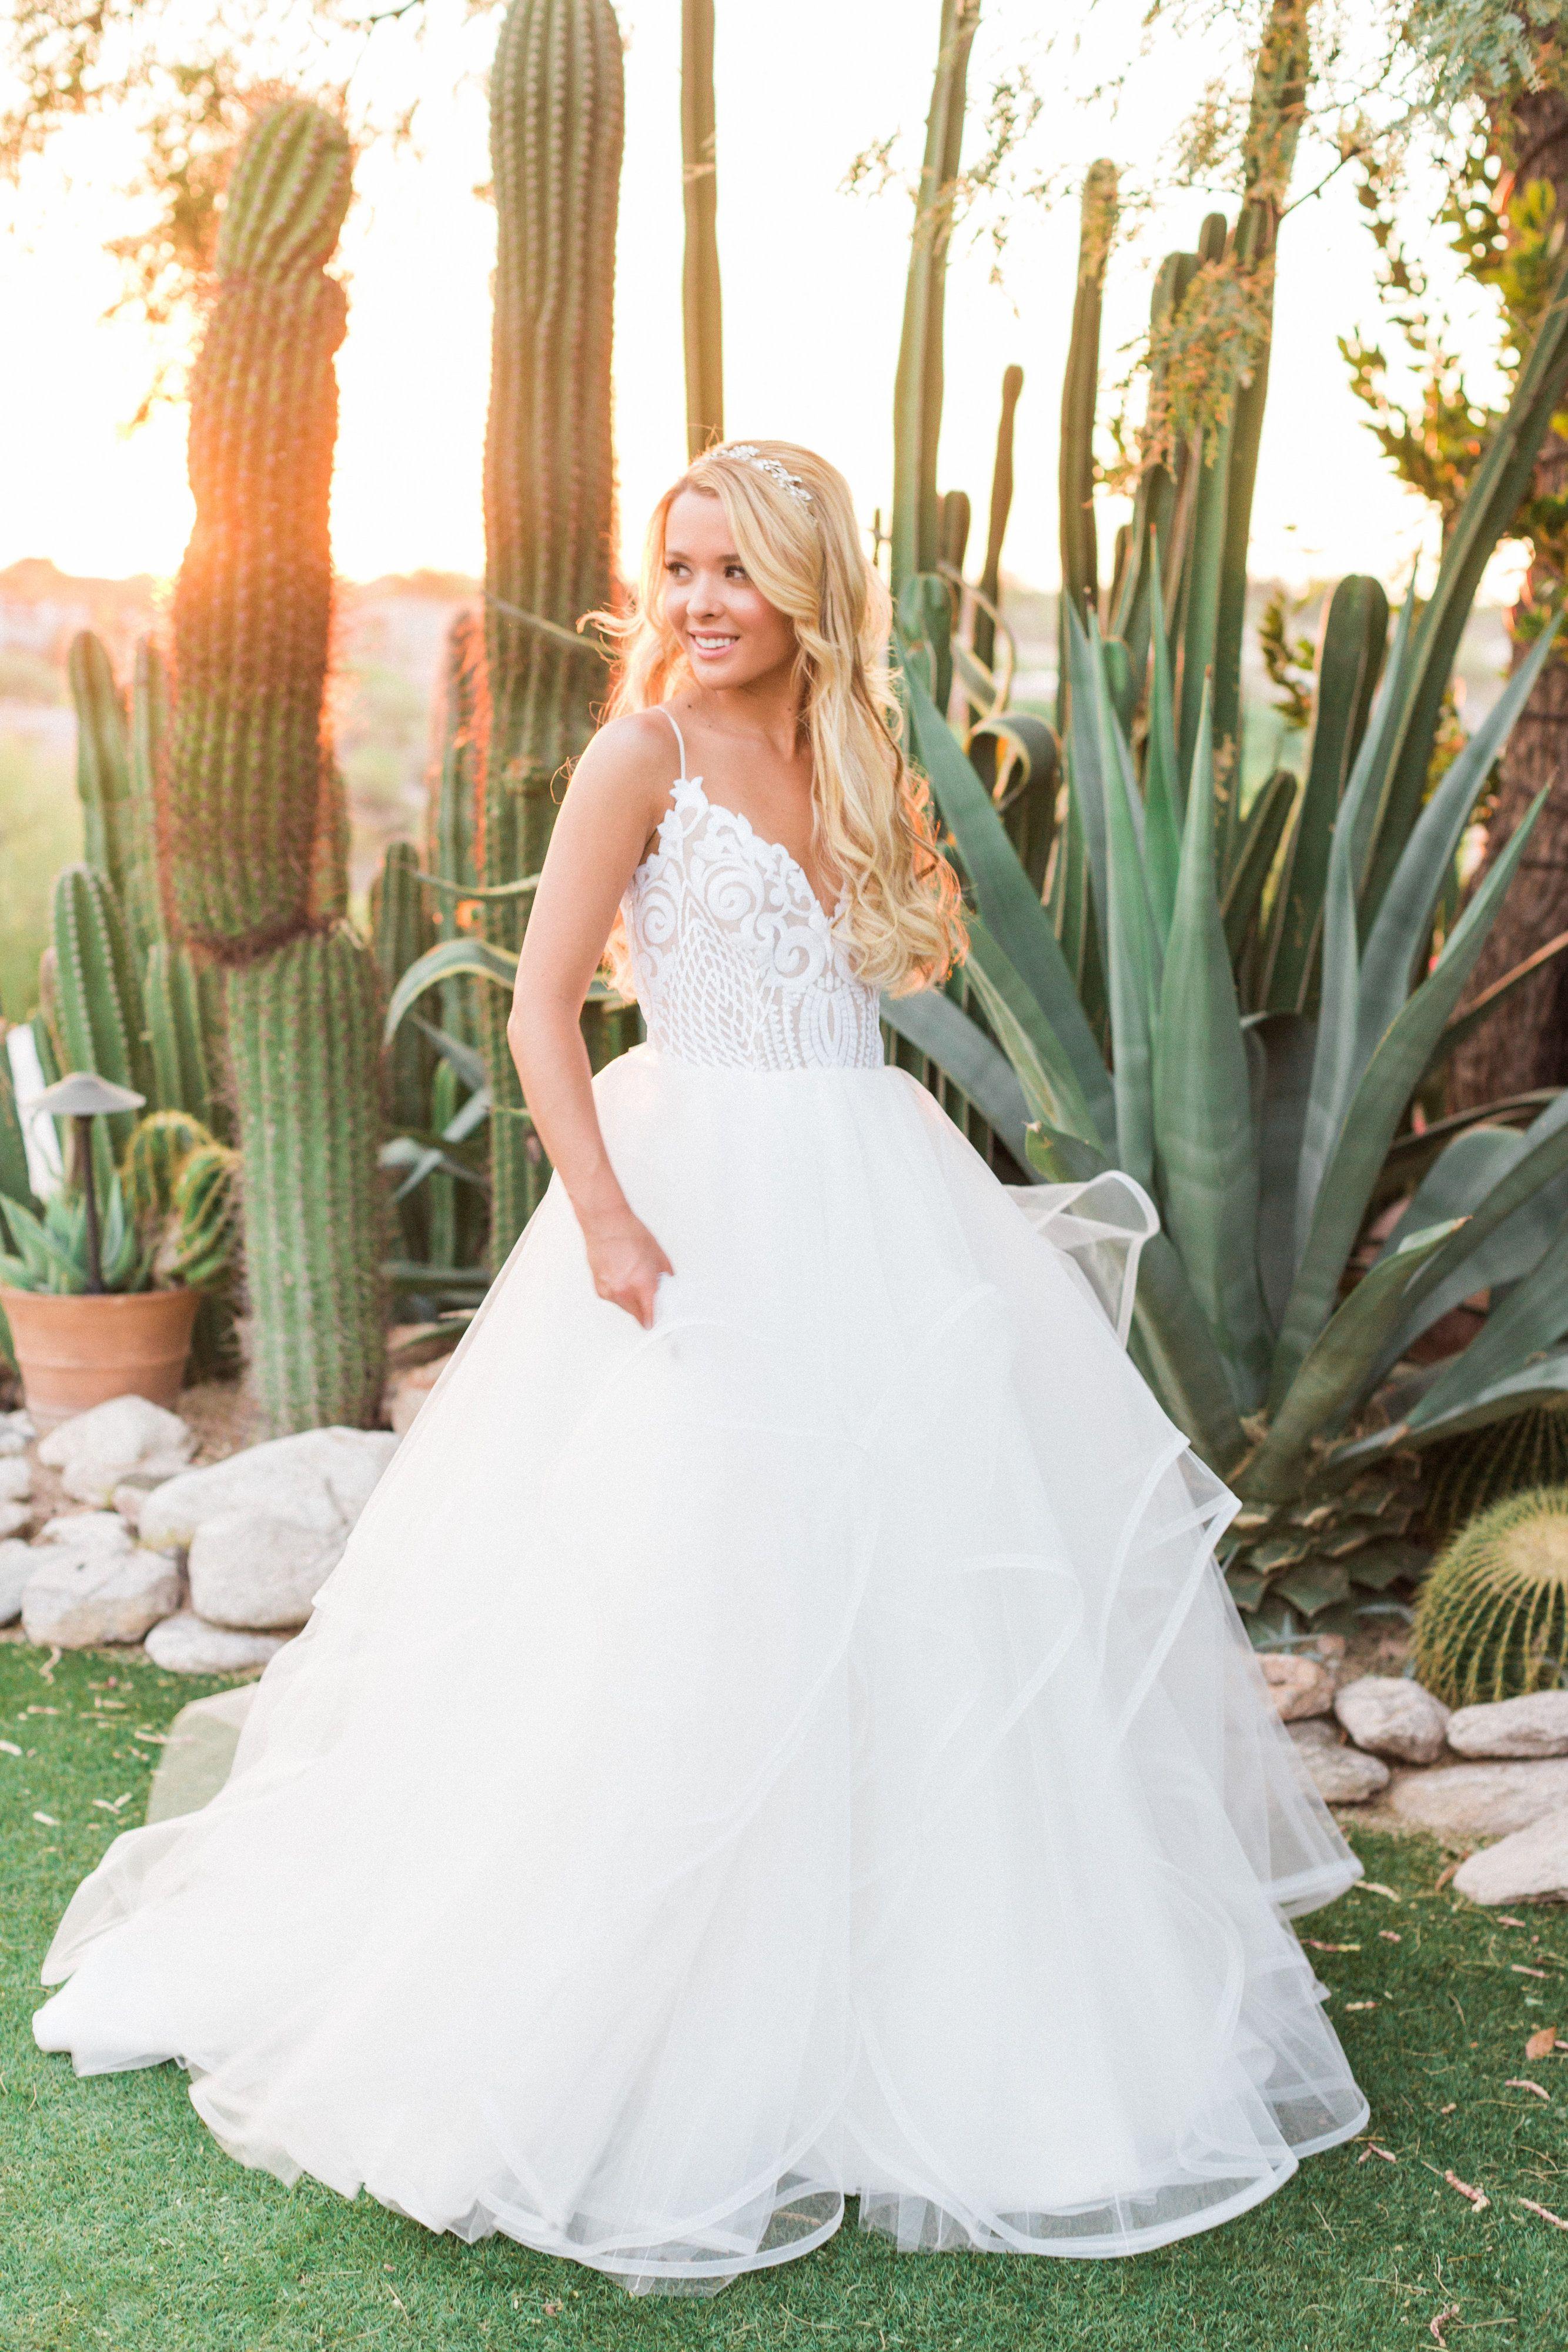 Crain + Co Styled Shoot at Hacienda del Sol Tucson, AZ Bride wearing ...